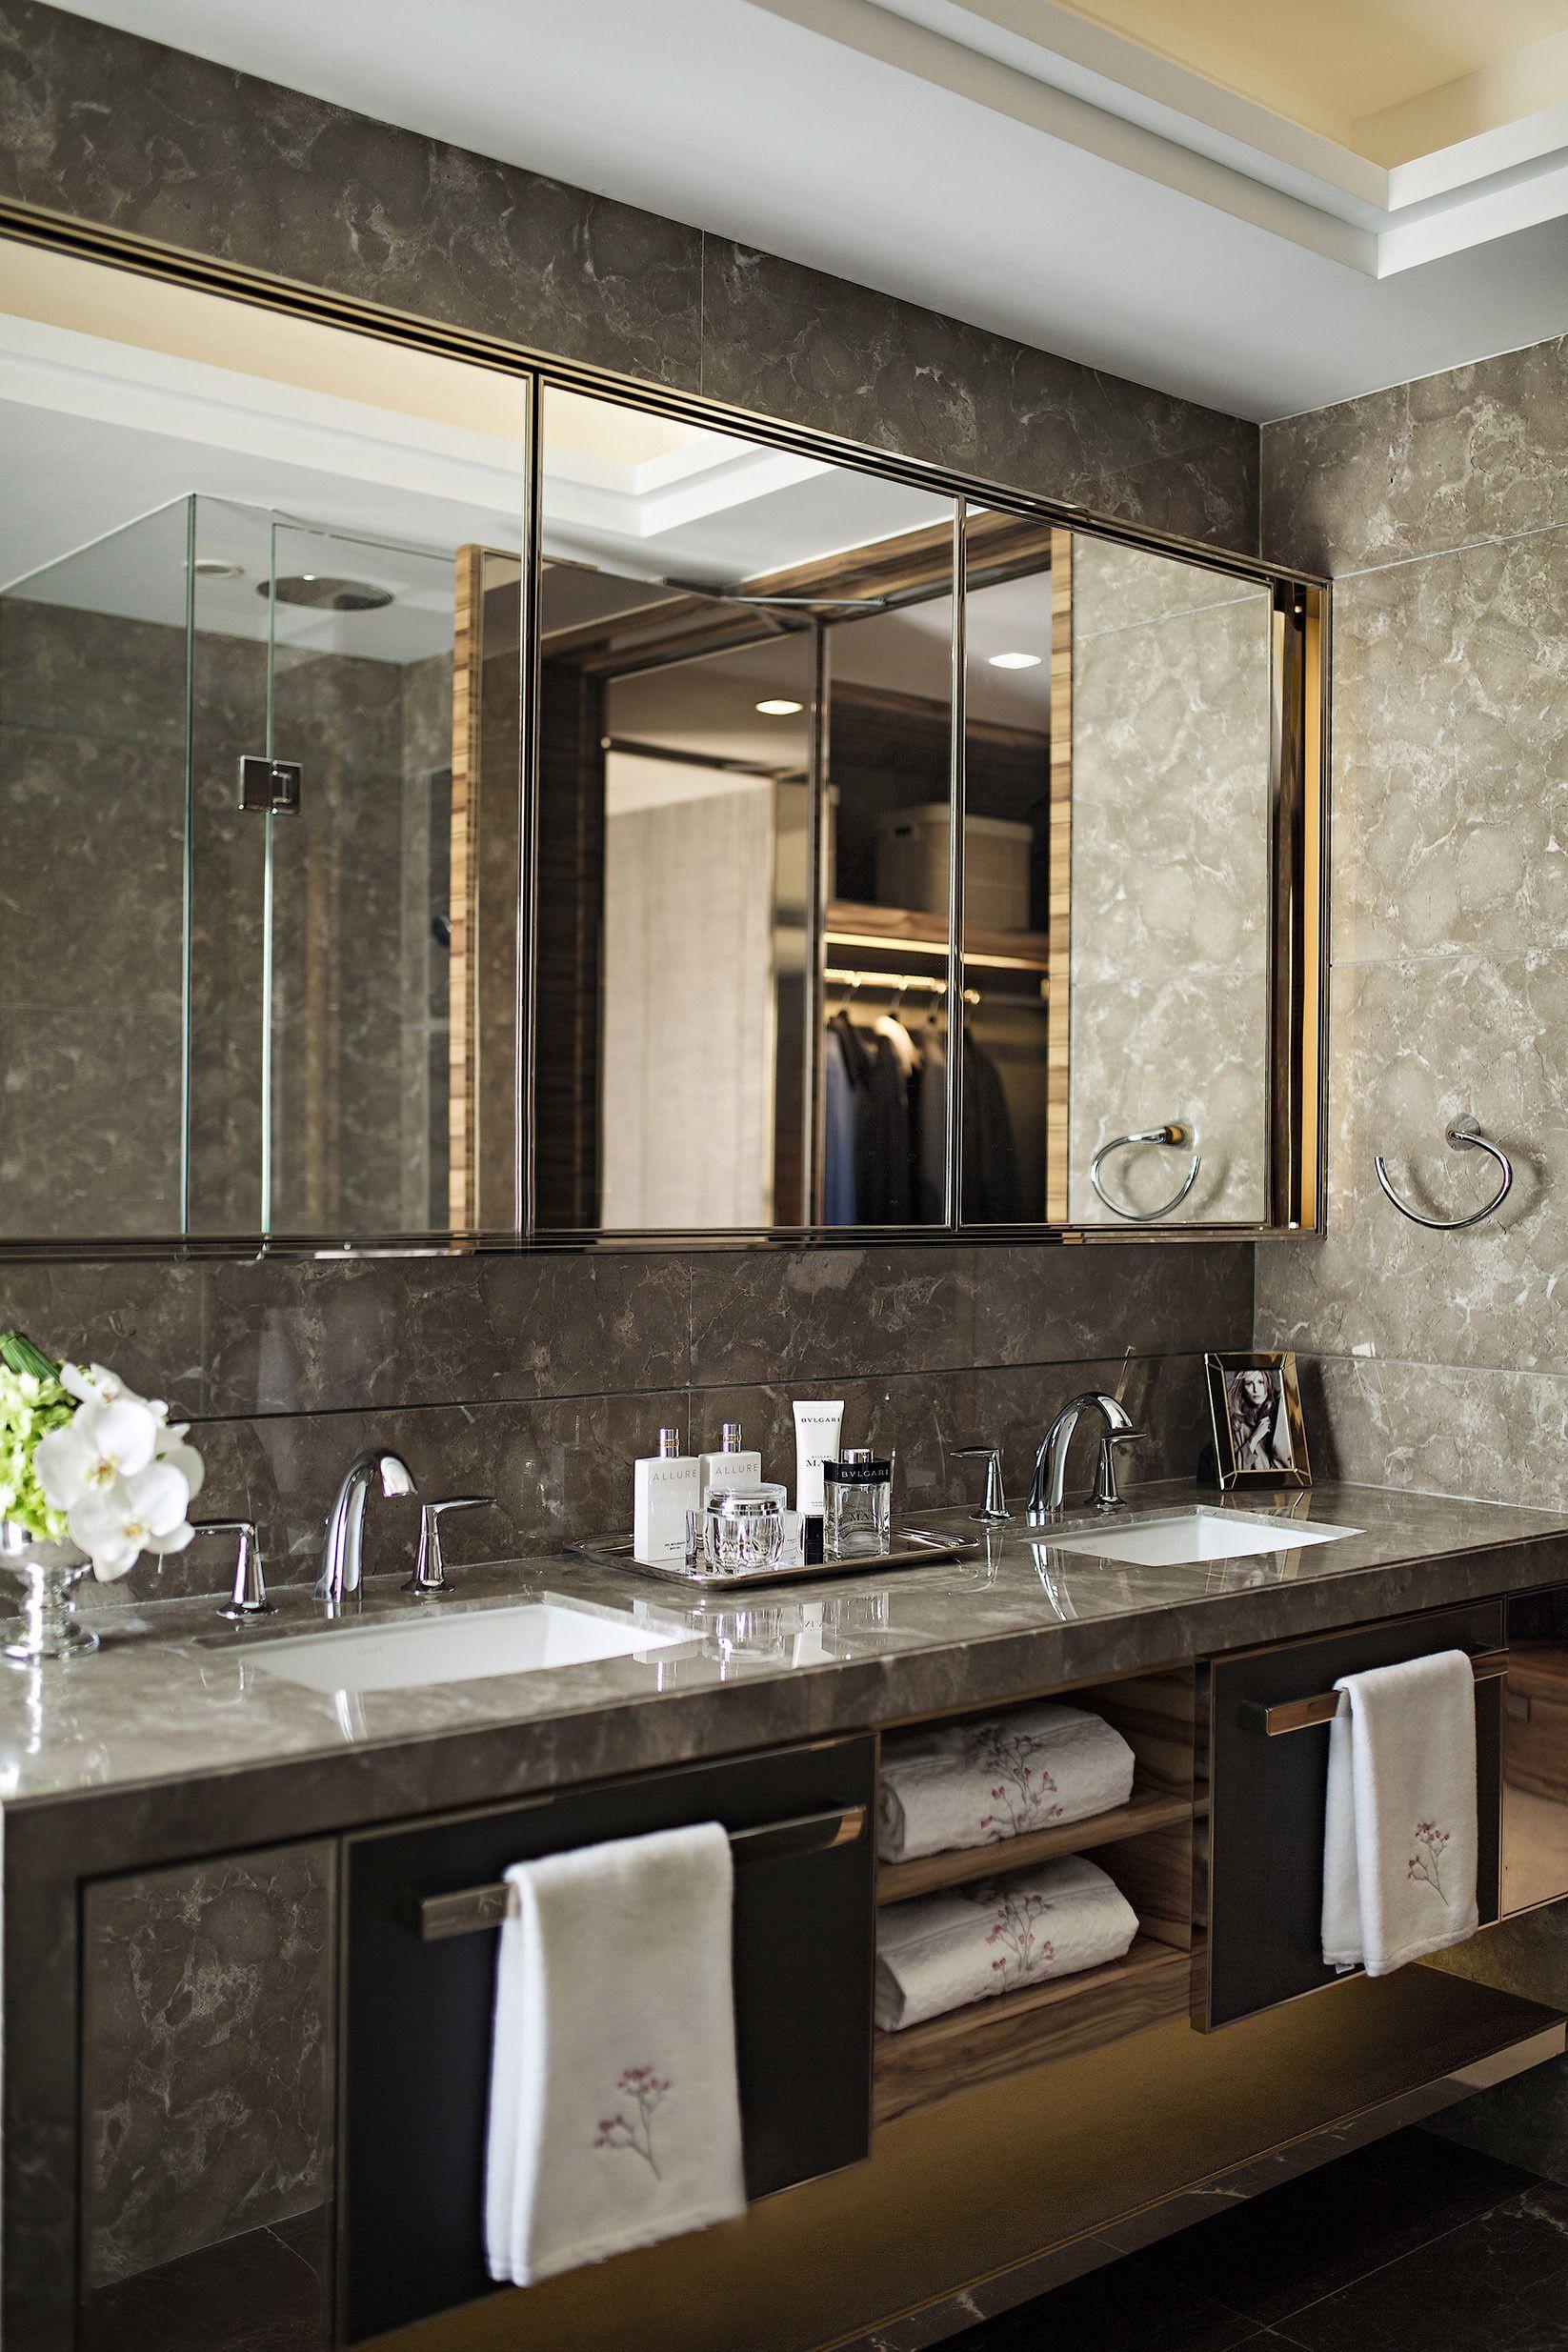 Discover Inspiration For Your Bathroom Bathroom Interior Design Enchanting Pictures Of Luxury Bathrooms Design Ideas